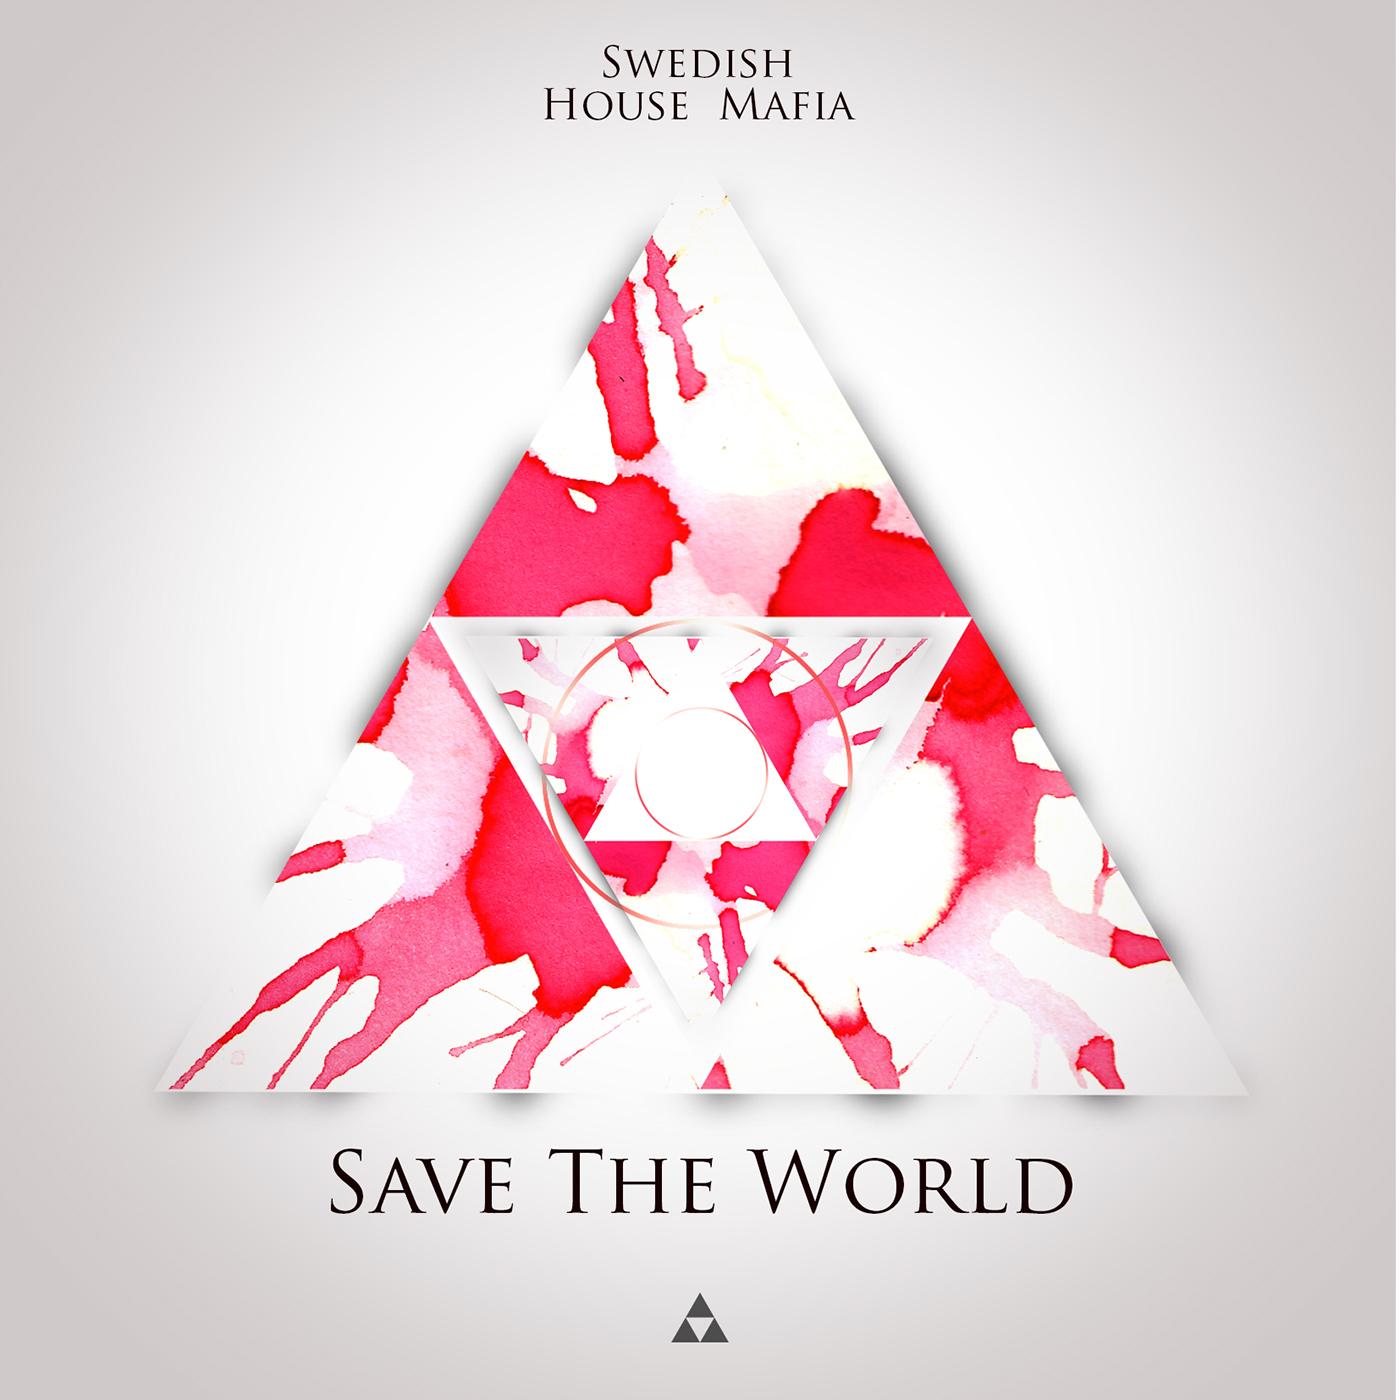 Swedish House Mafia Full Album